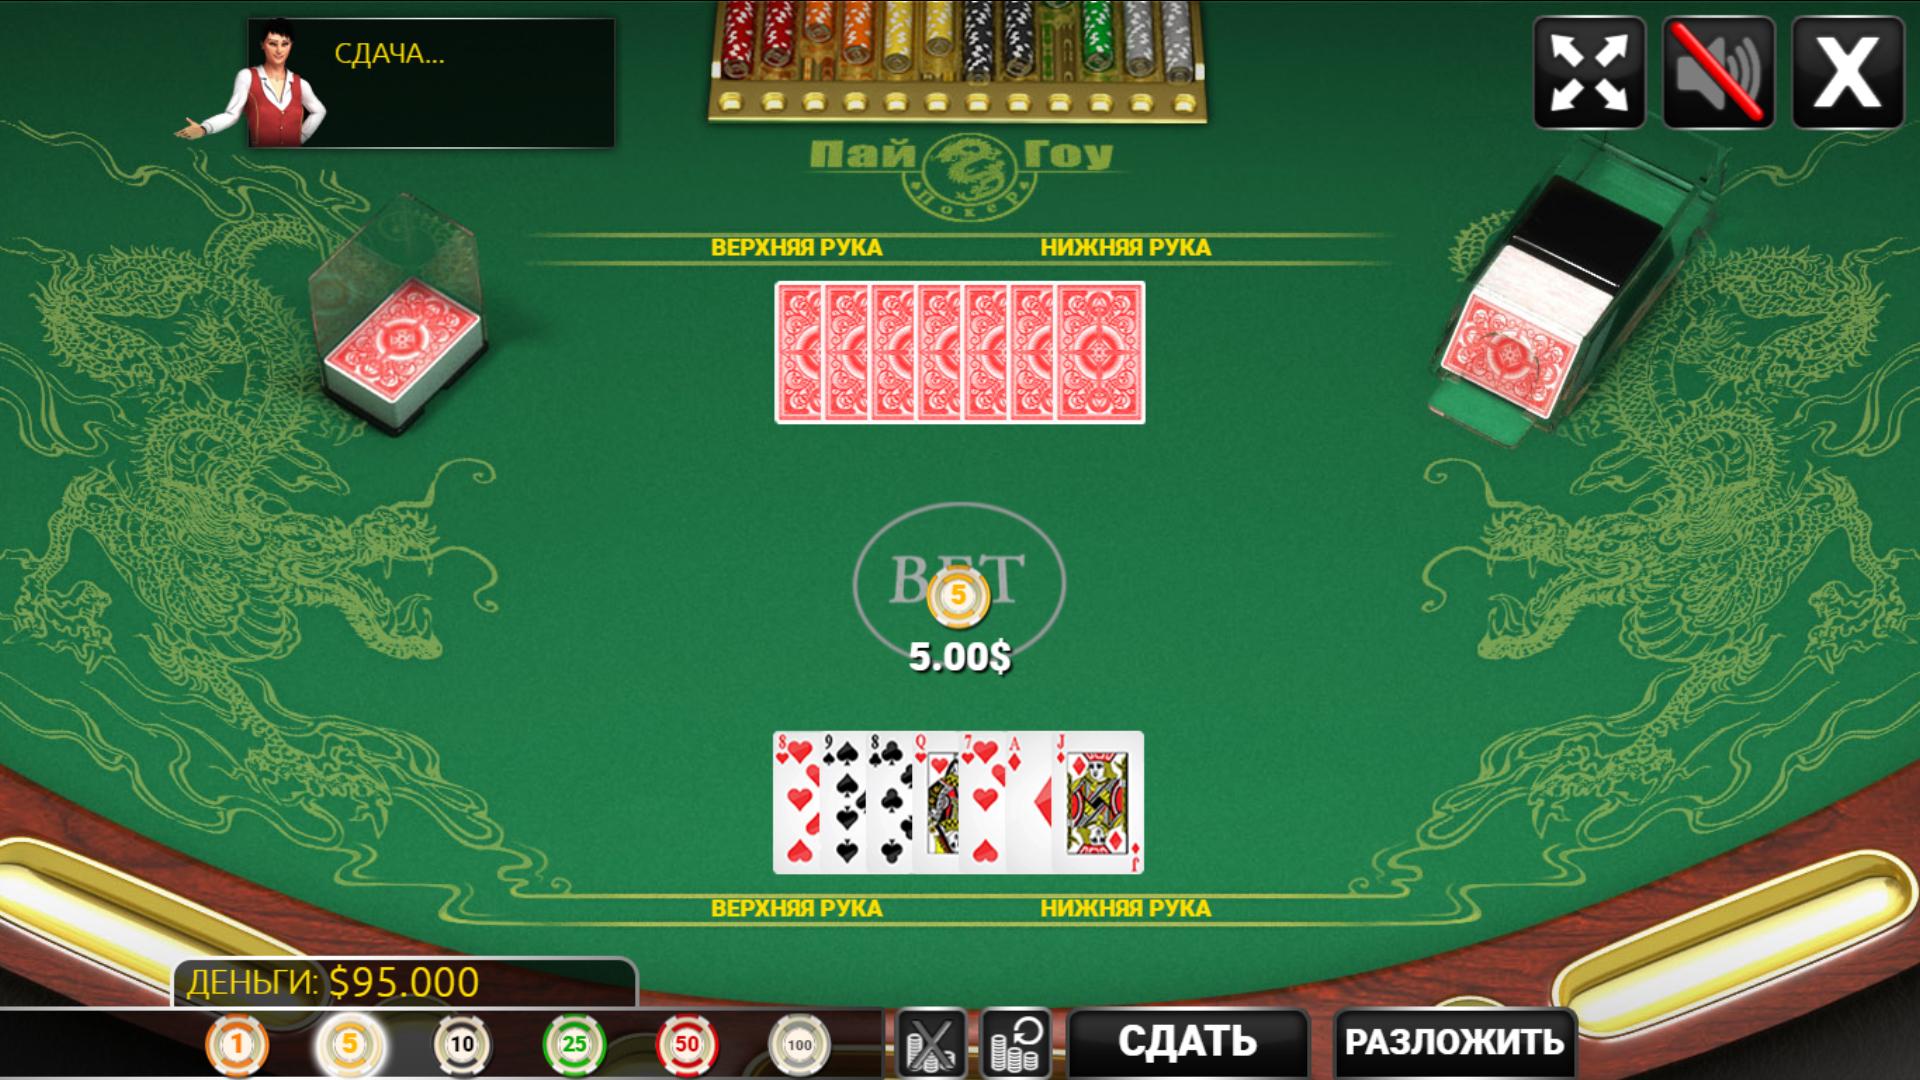 Яндекс игры онлайн покер картина обезьяны играют в карты